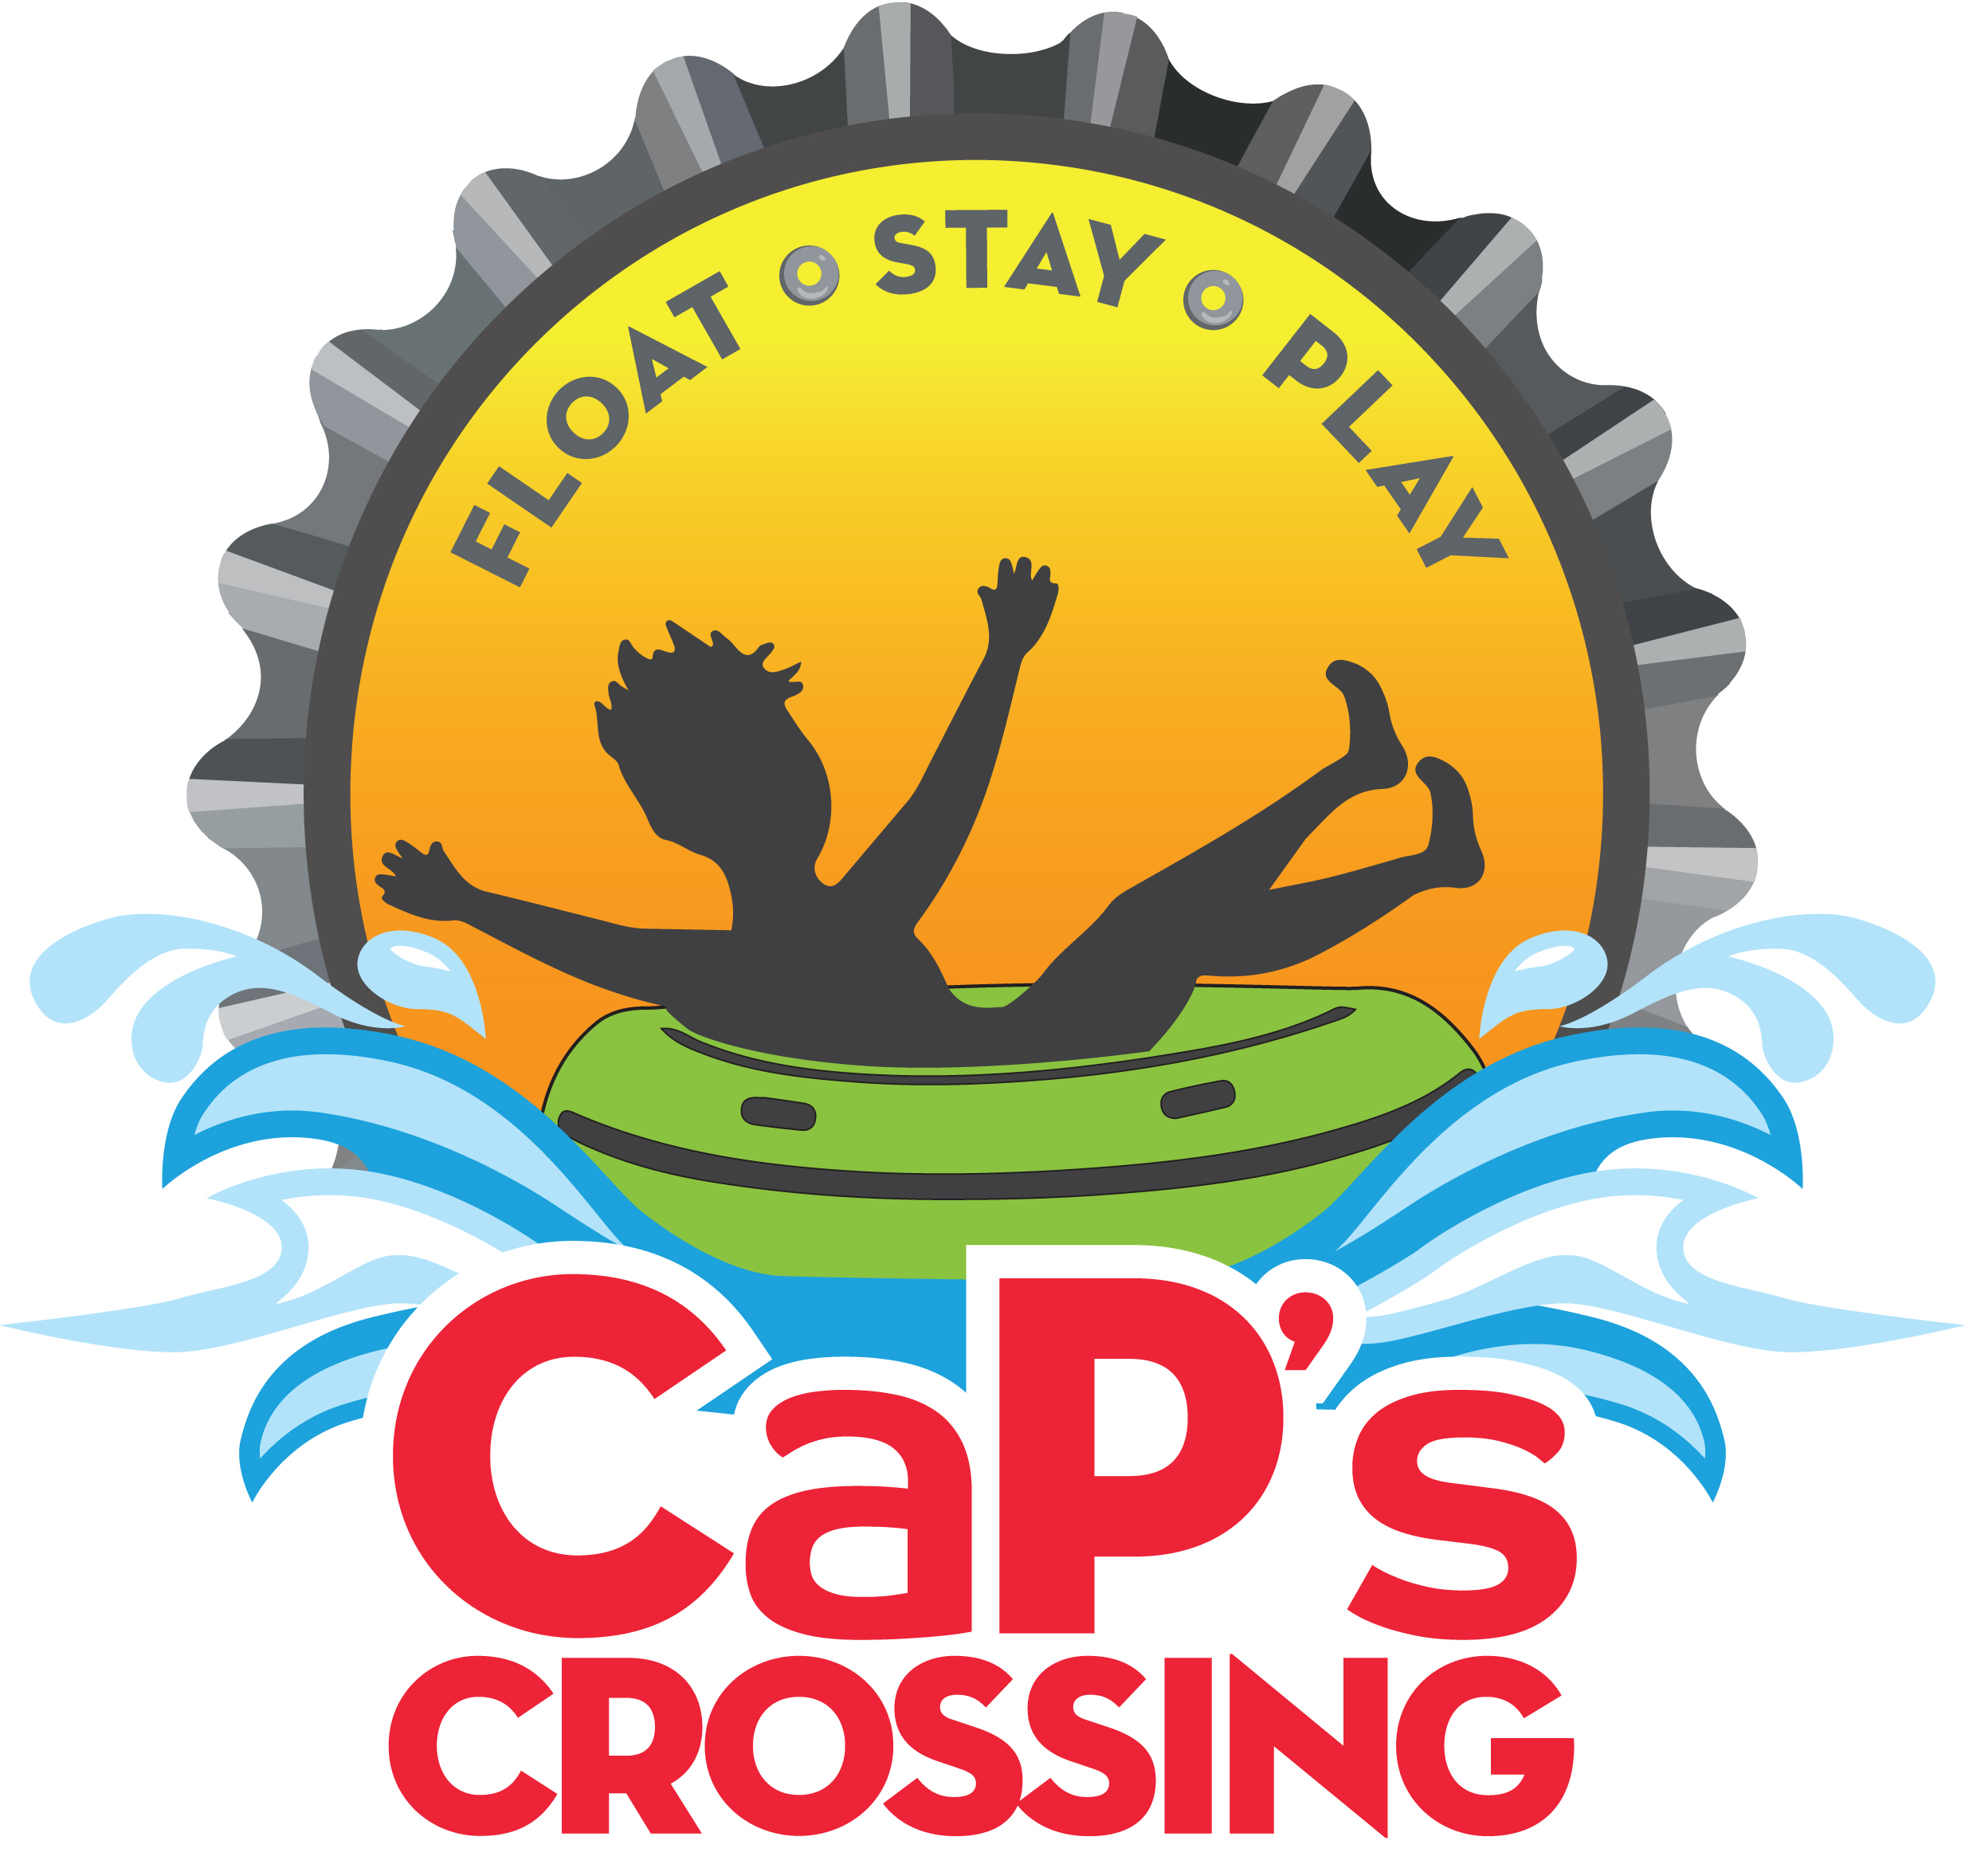 CaP's Crossing